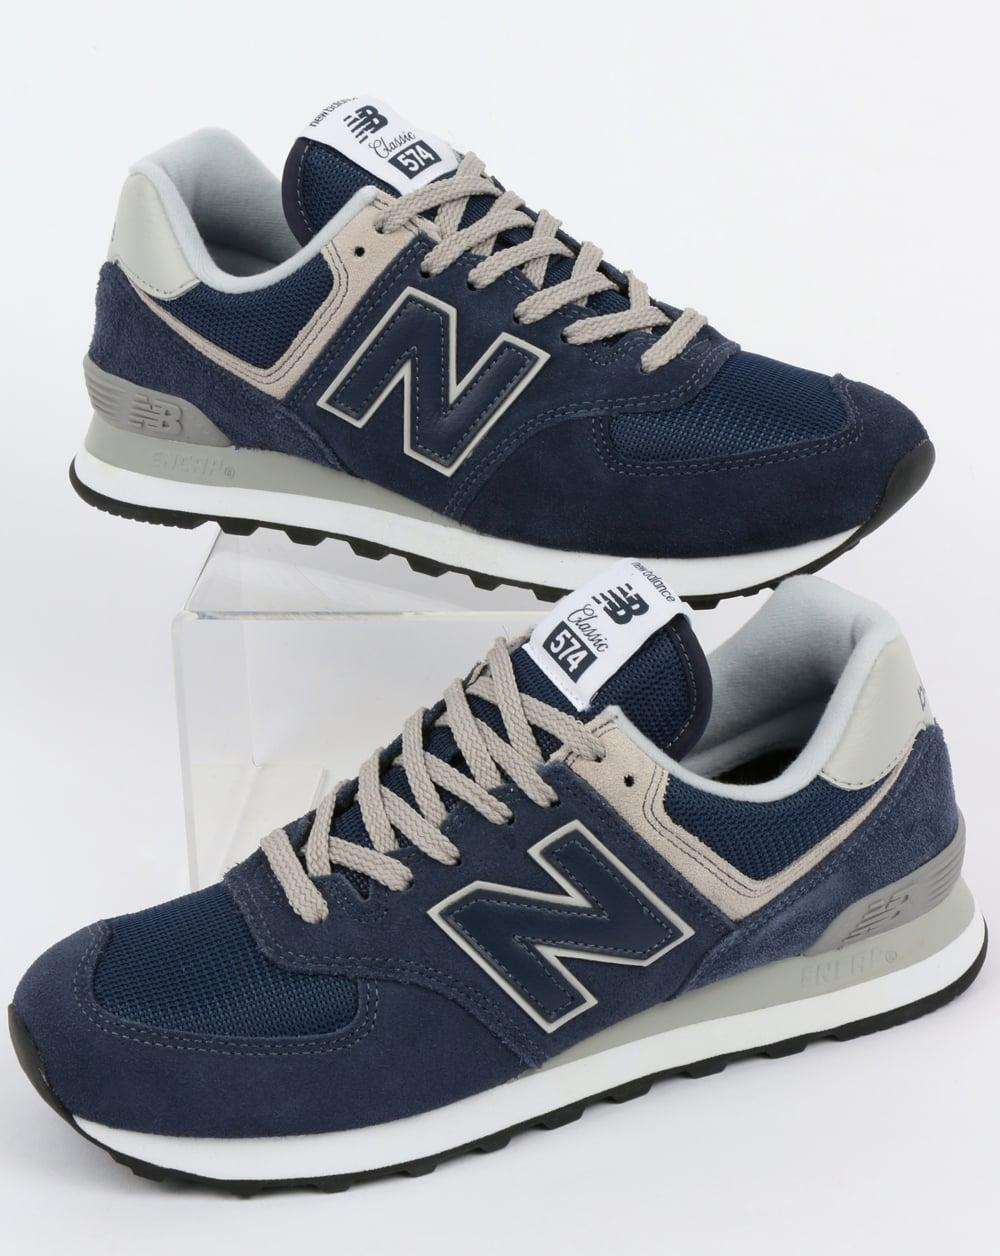 new balance 574 grey blue